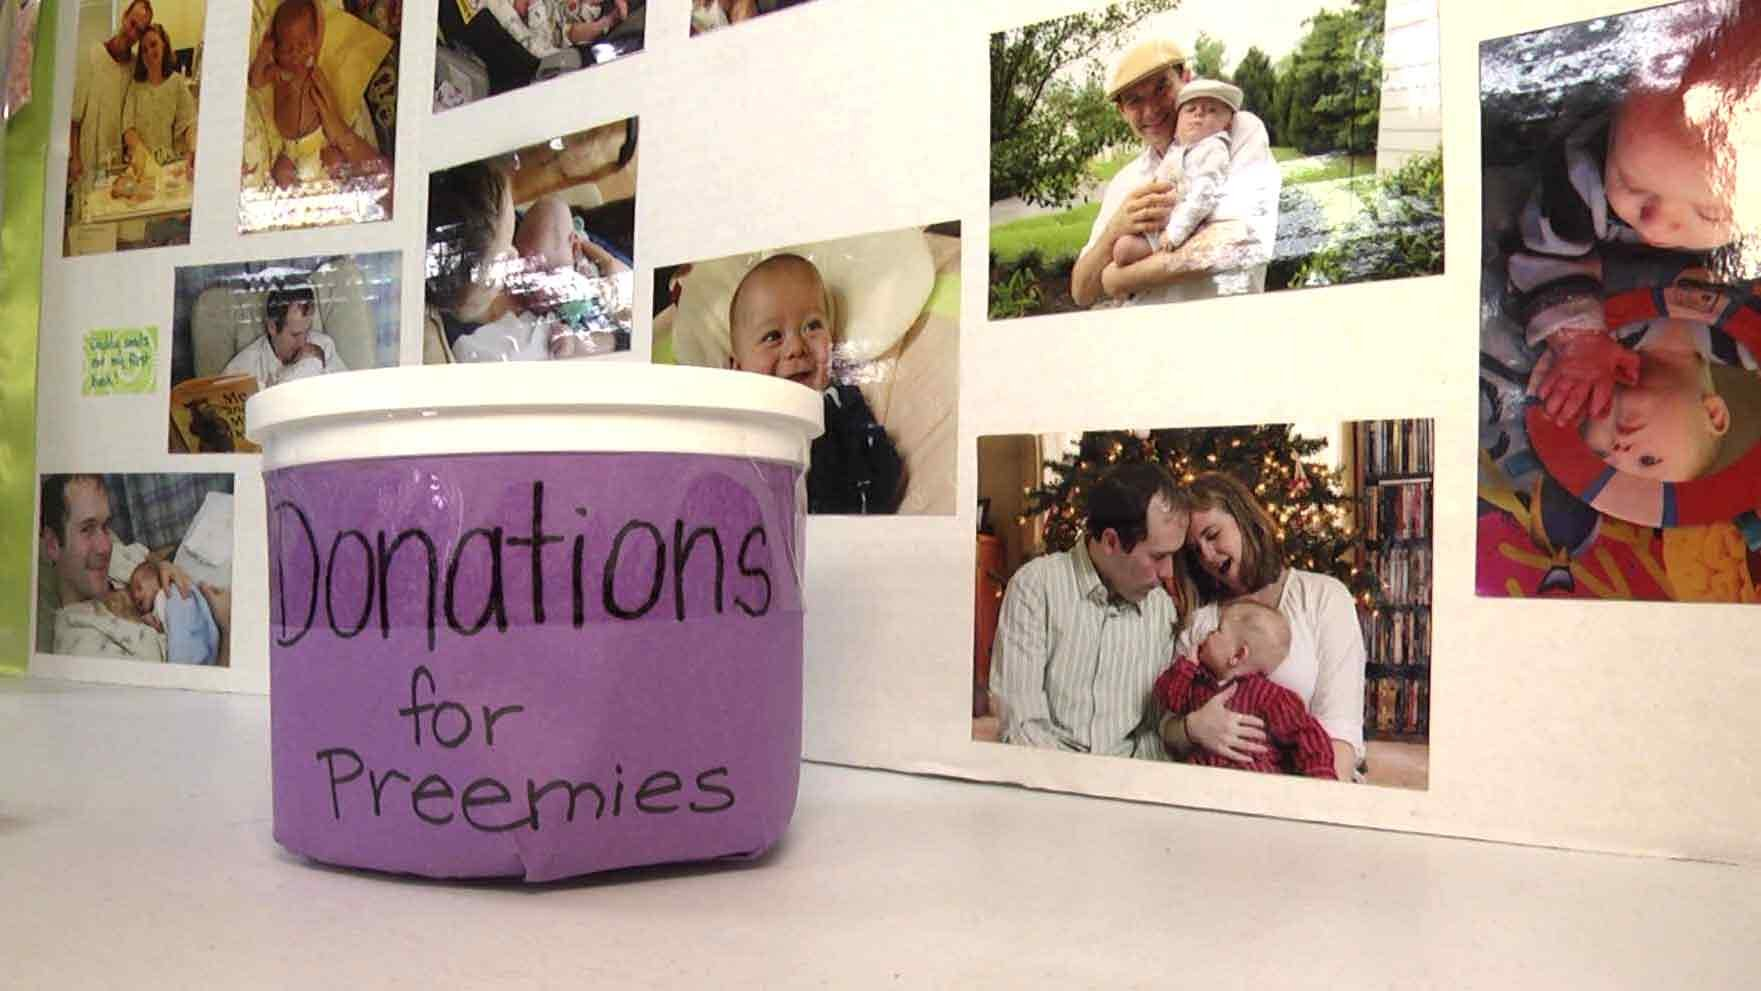 A donation jar for preemies.